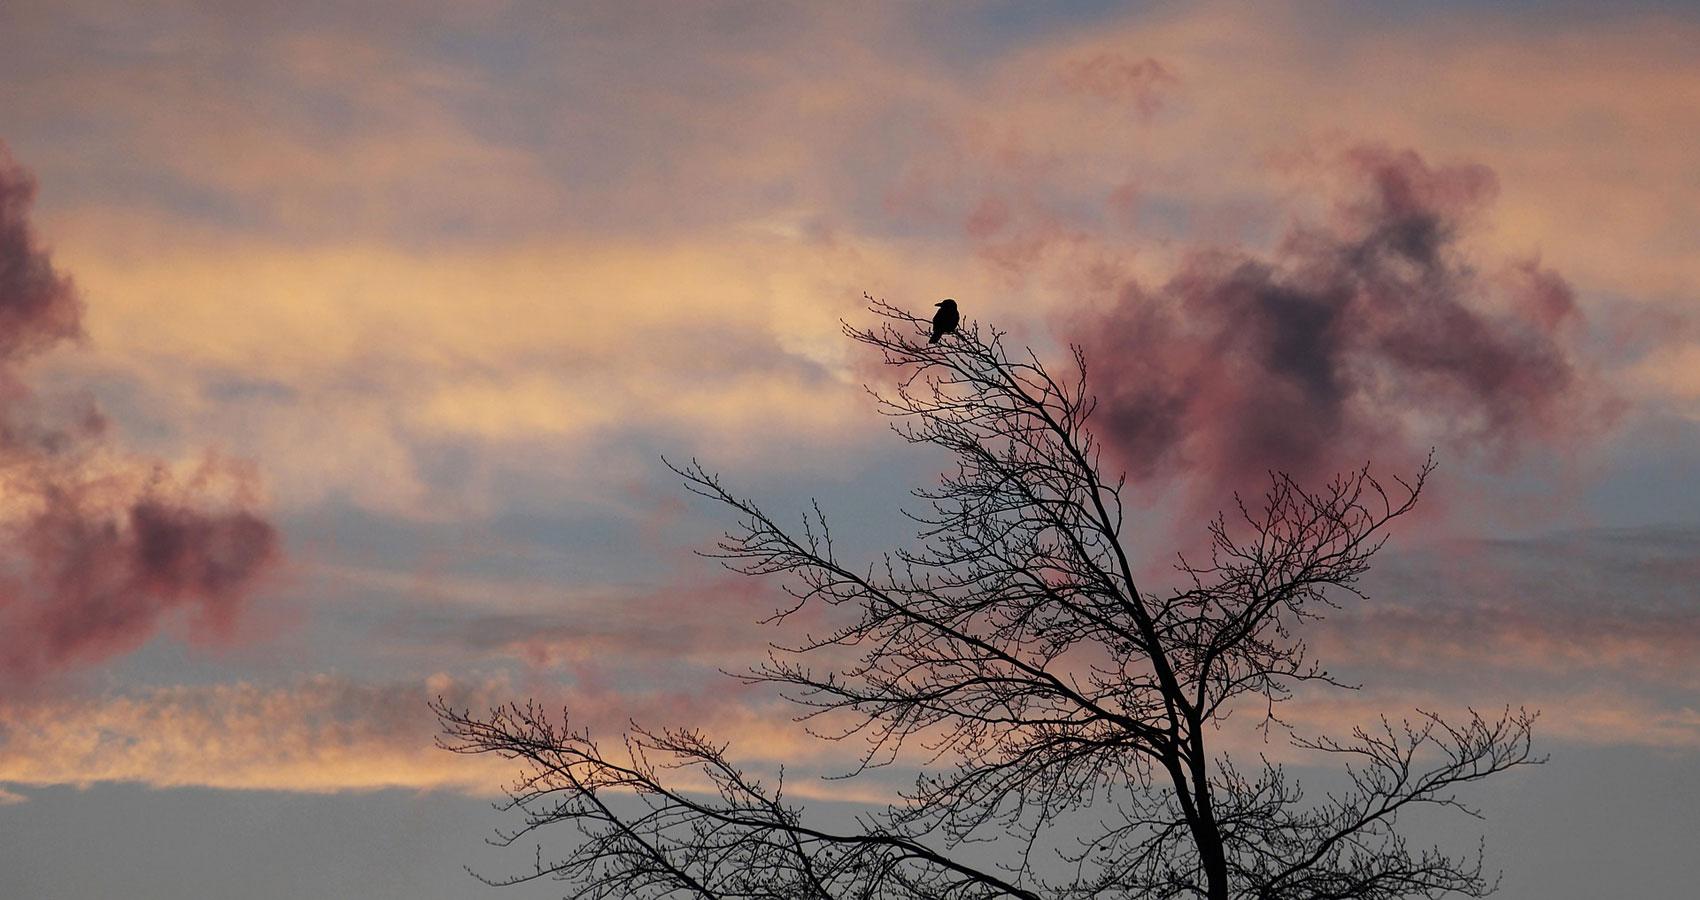 Wounded Bird, a poem written by Mountassir Aziz at Spillwords.com